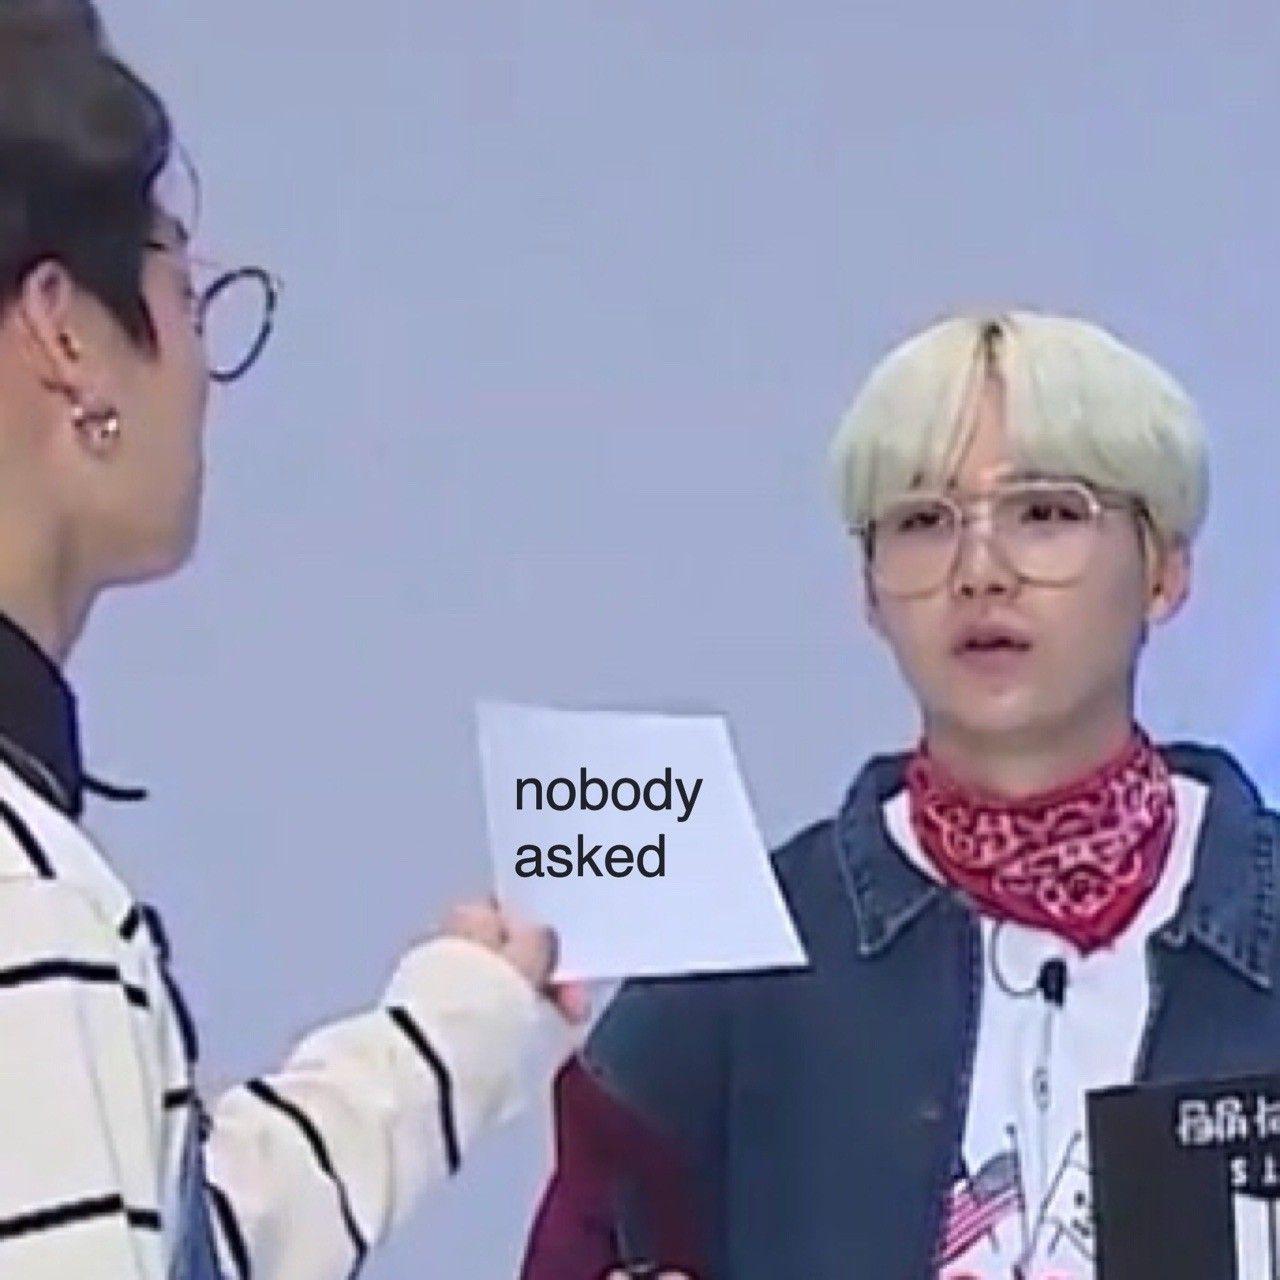 Nobody asked hoe | Meme/Funny $h!t in 2019 | Bts memes